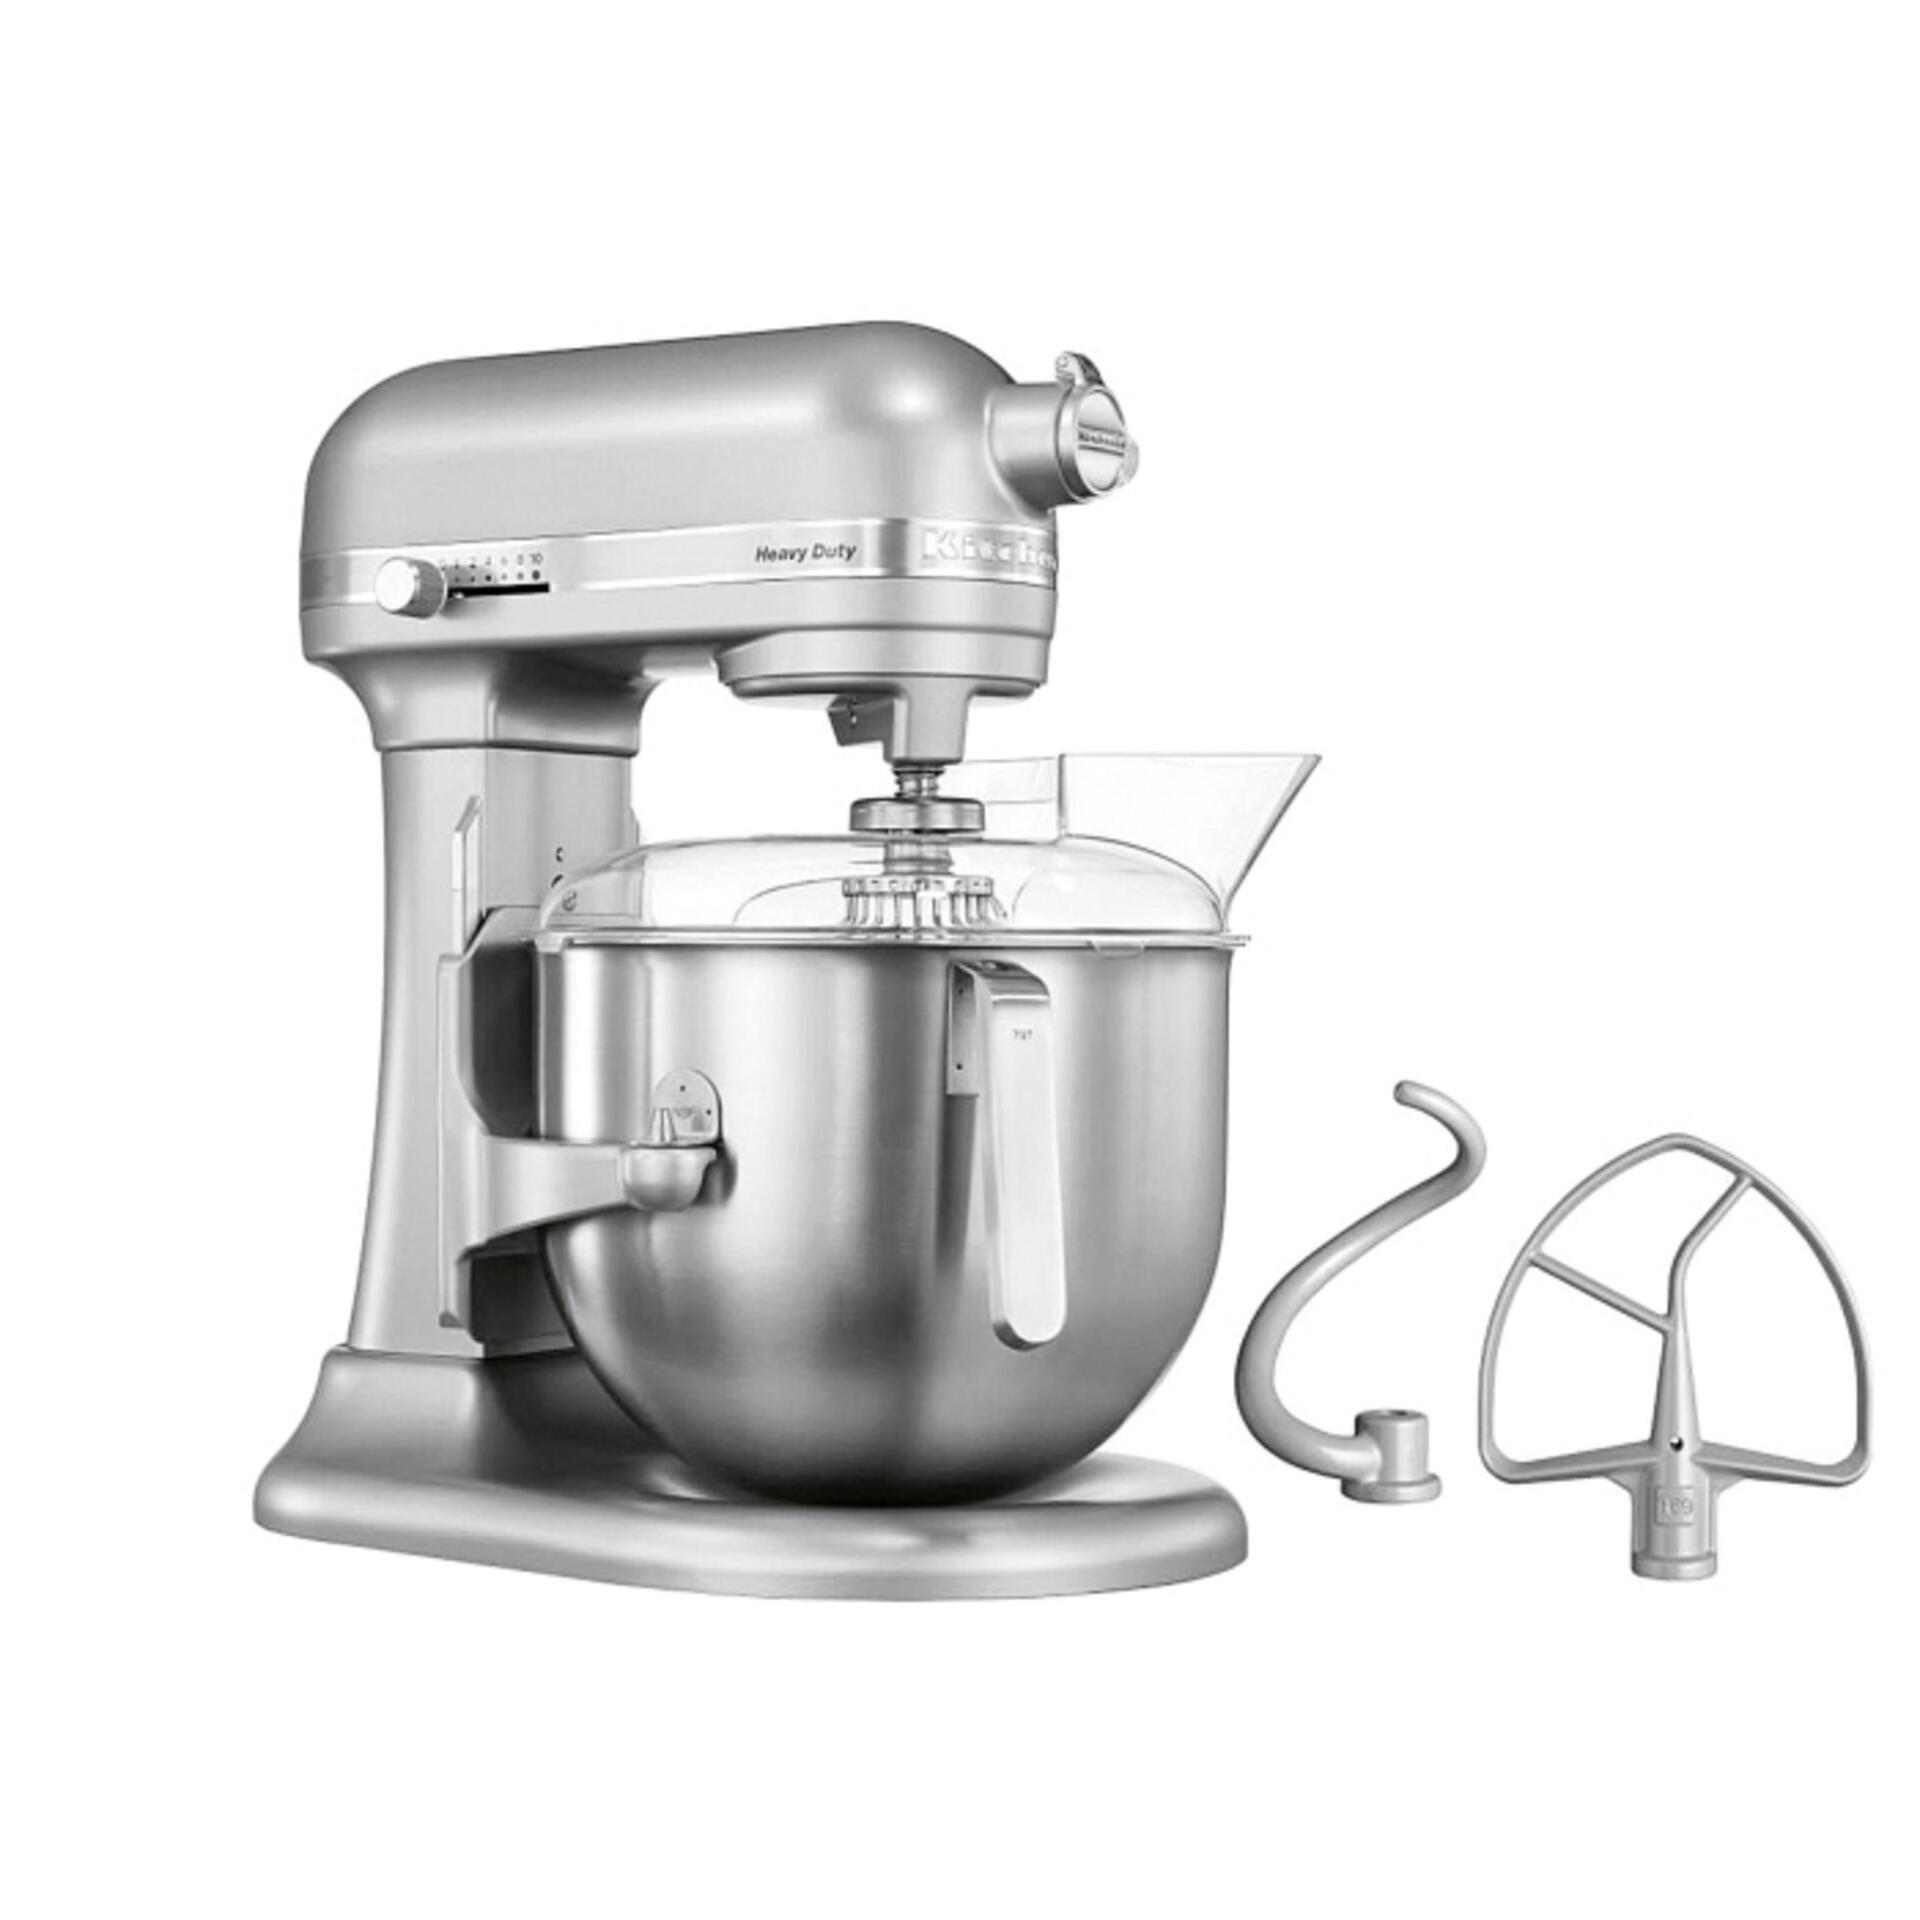 Kitchenaid Heavy Duty Küchenmaschine 6,9 Liter 5KSM7591XESM Silber